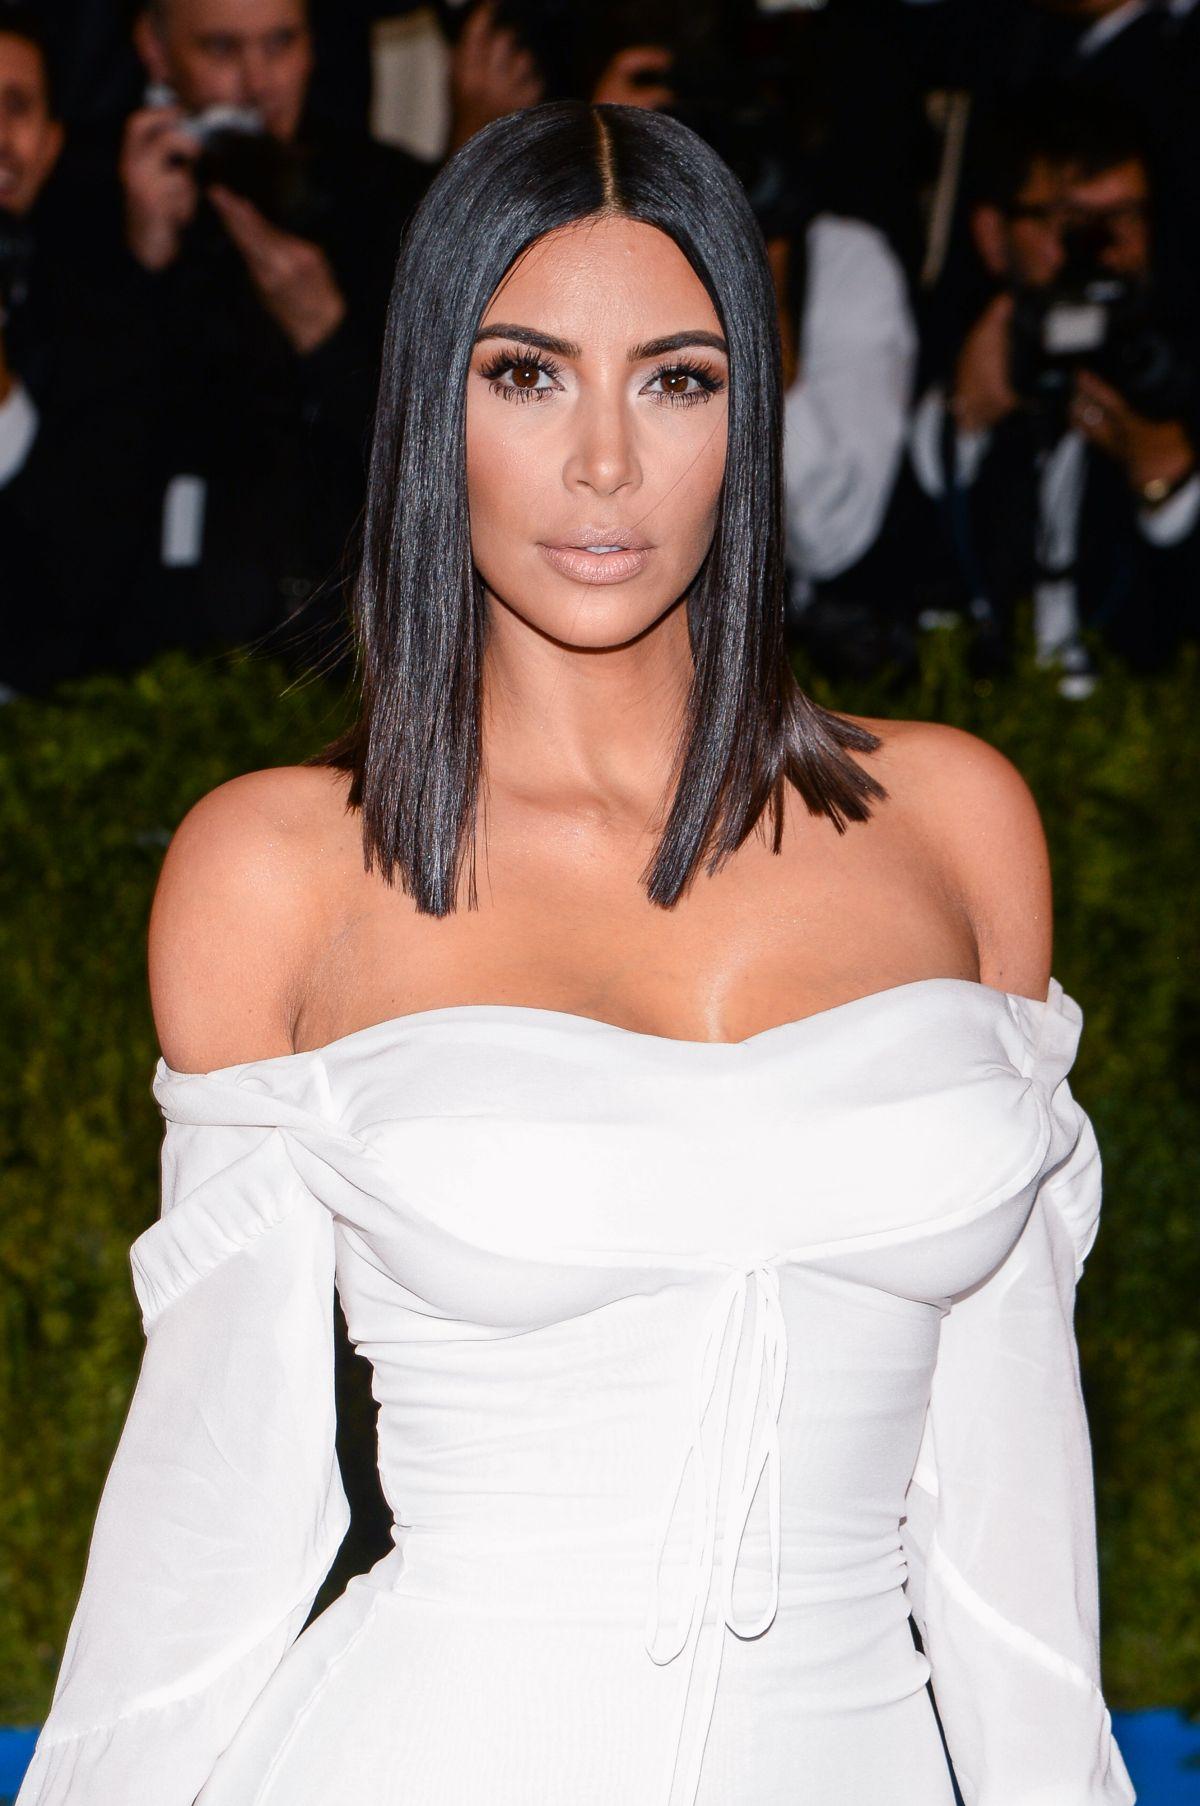 KIM KARDASHIAN at 2017 MET Gala in New York 05/01/2017 ... Kim Kardashian